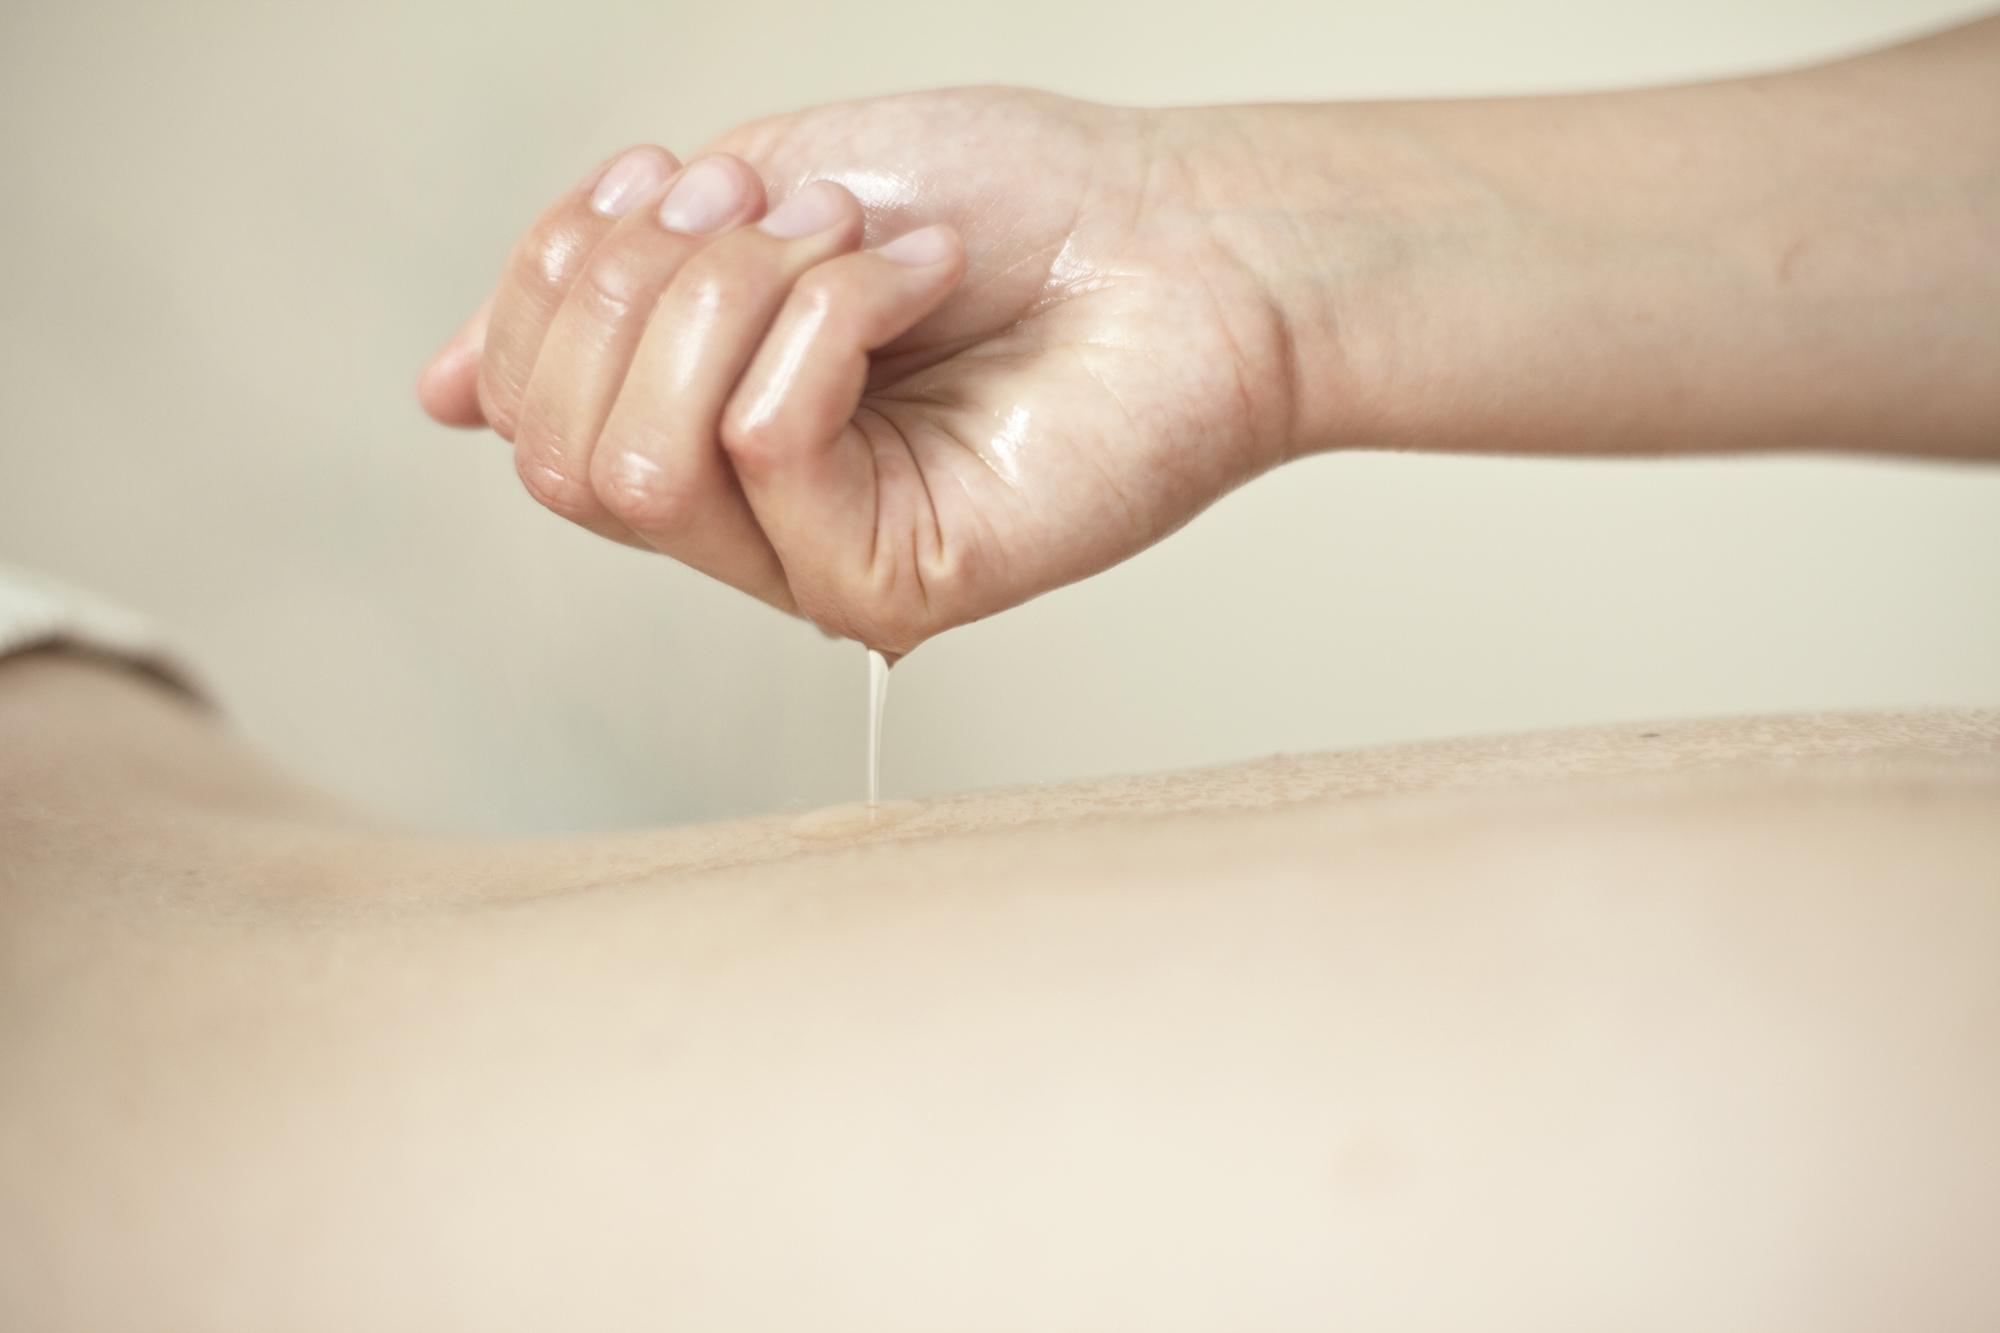 homoseksuel massage århus sex bordel nordjylland